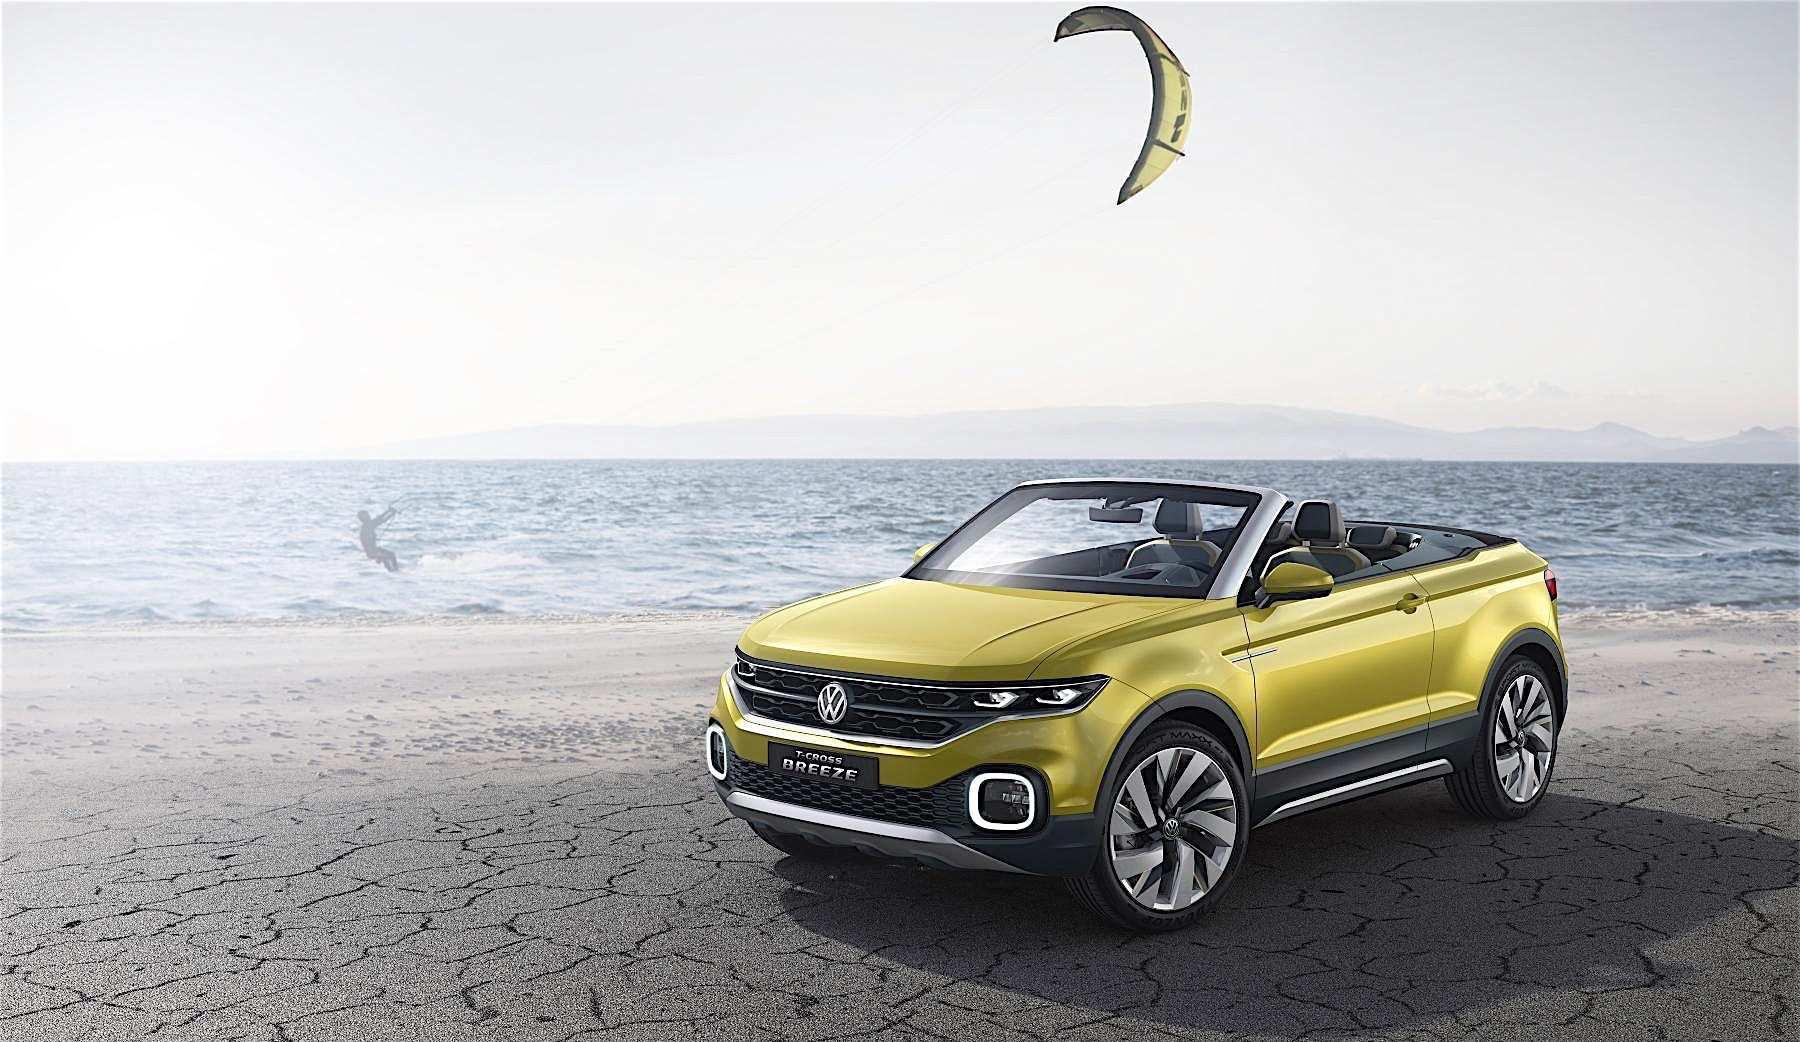 85 Concept of Volkswagen T Roc Cabrio 2020 Price for Volkswagen T Roc Cabrio 2020